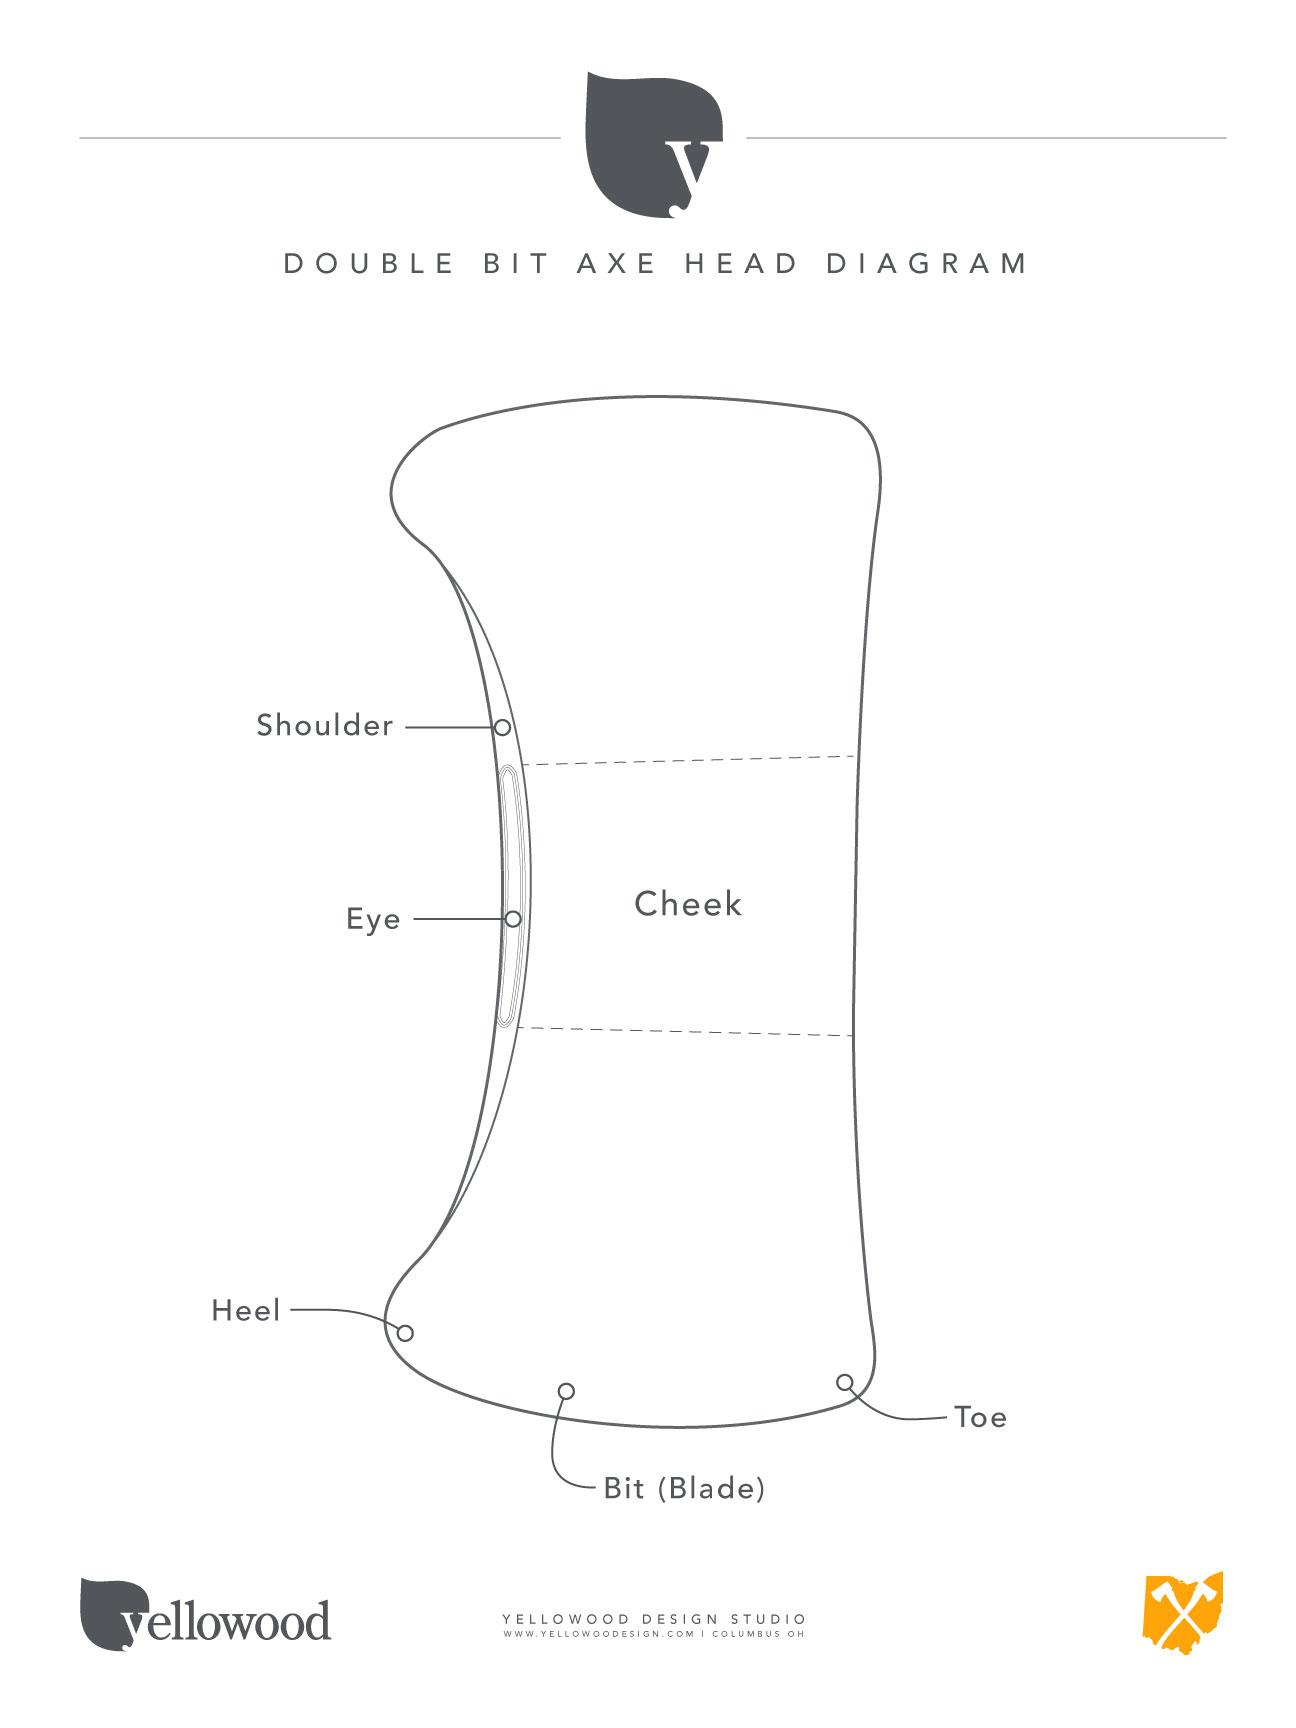 Double bit axe head diagram.